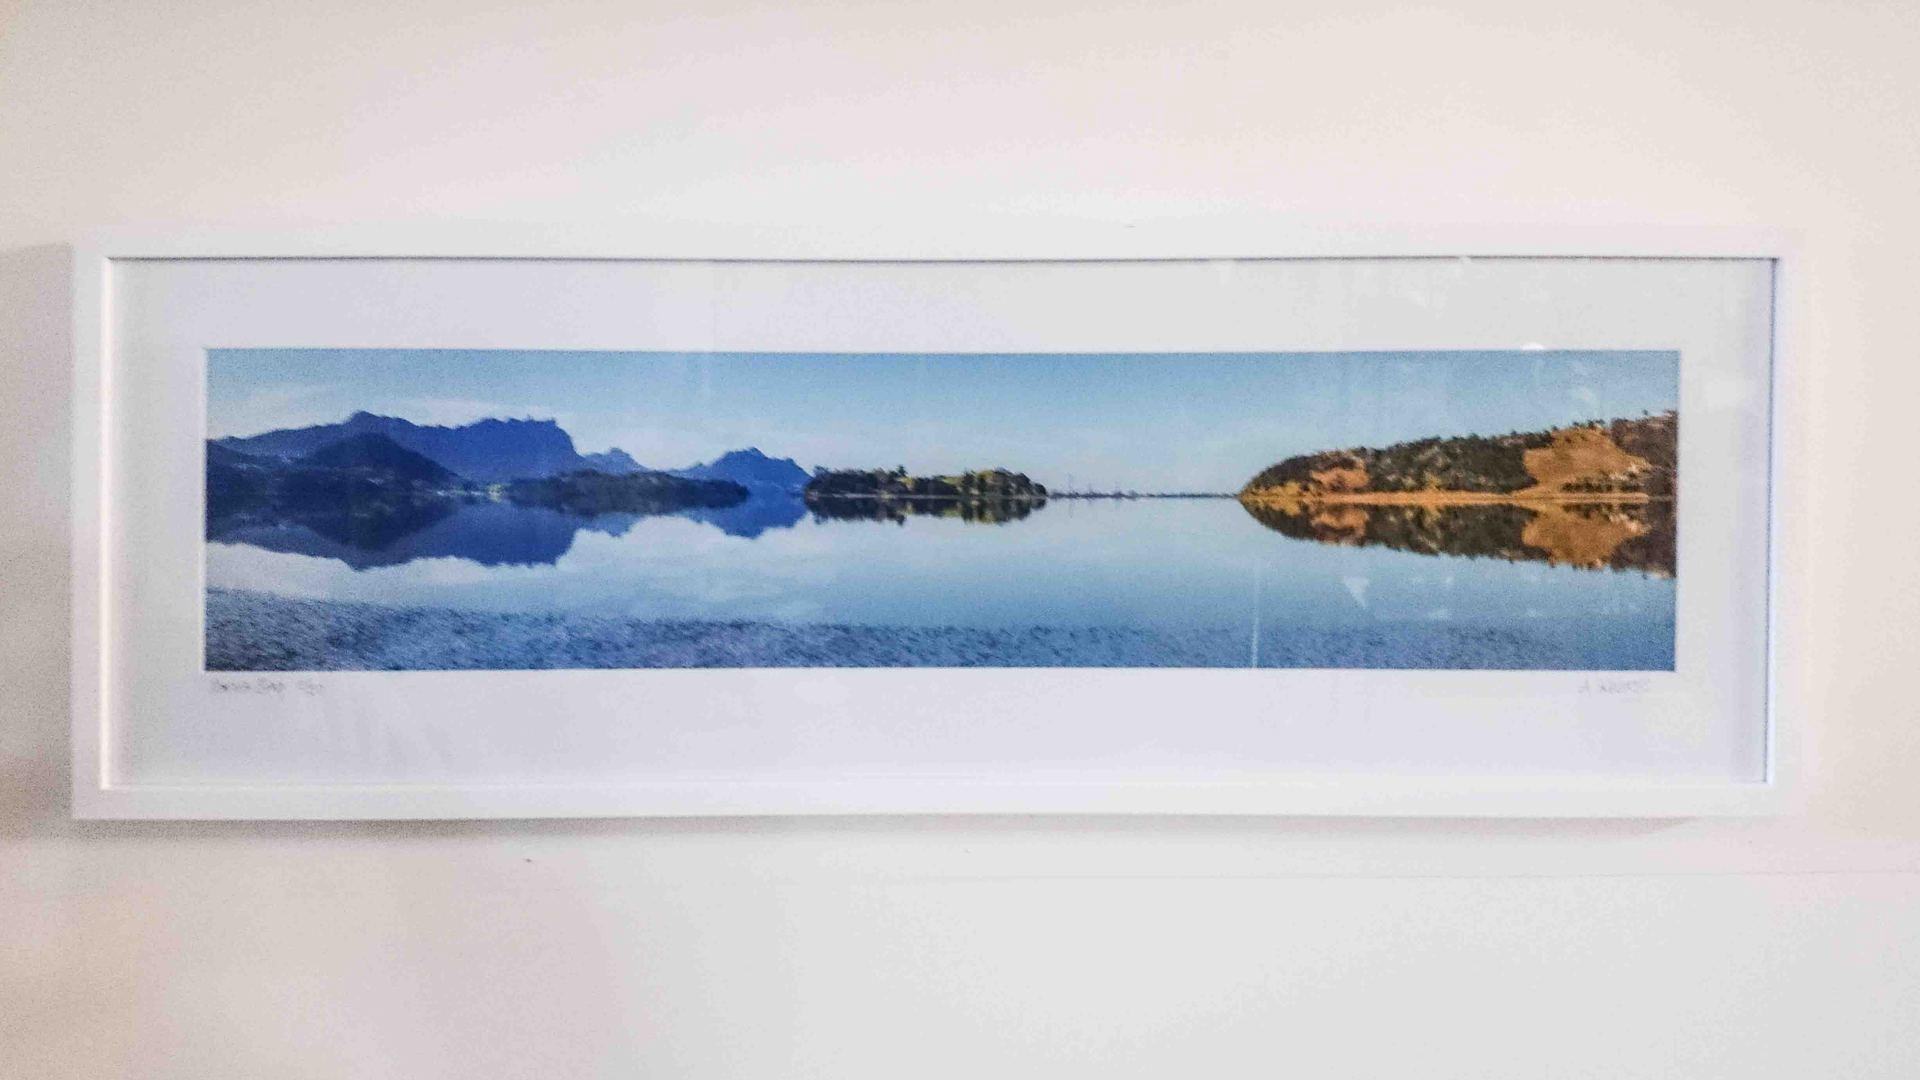 parua bay framed print